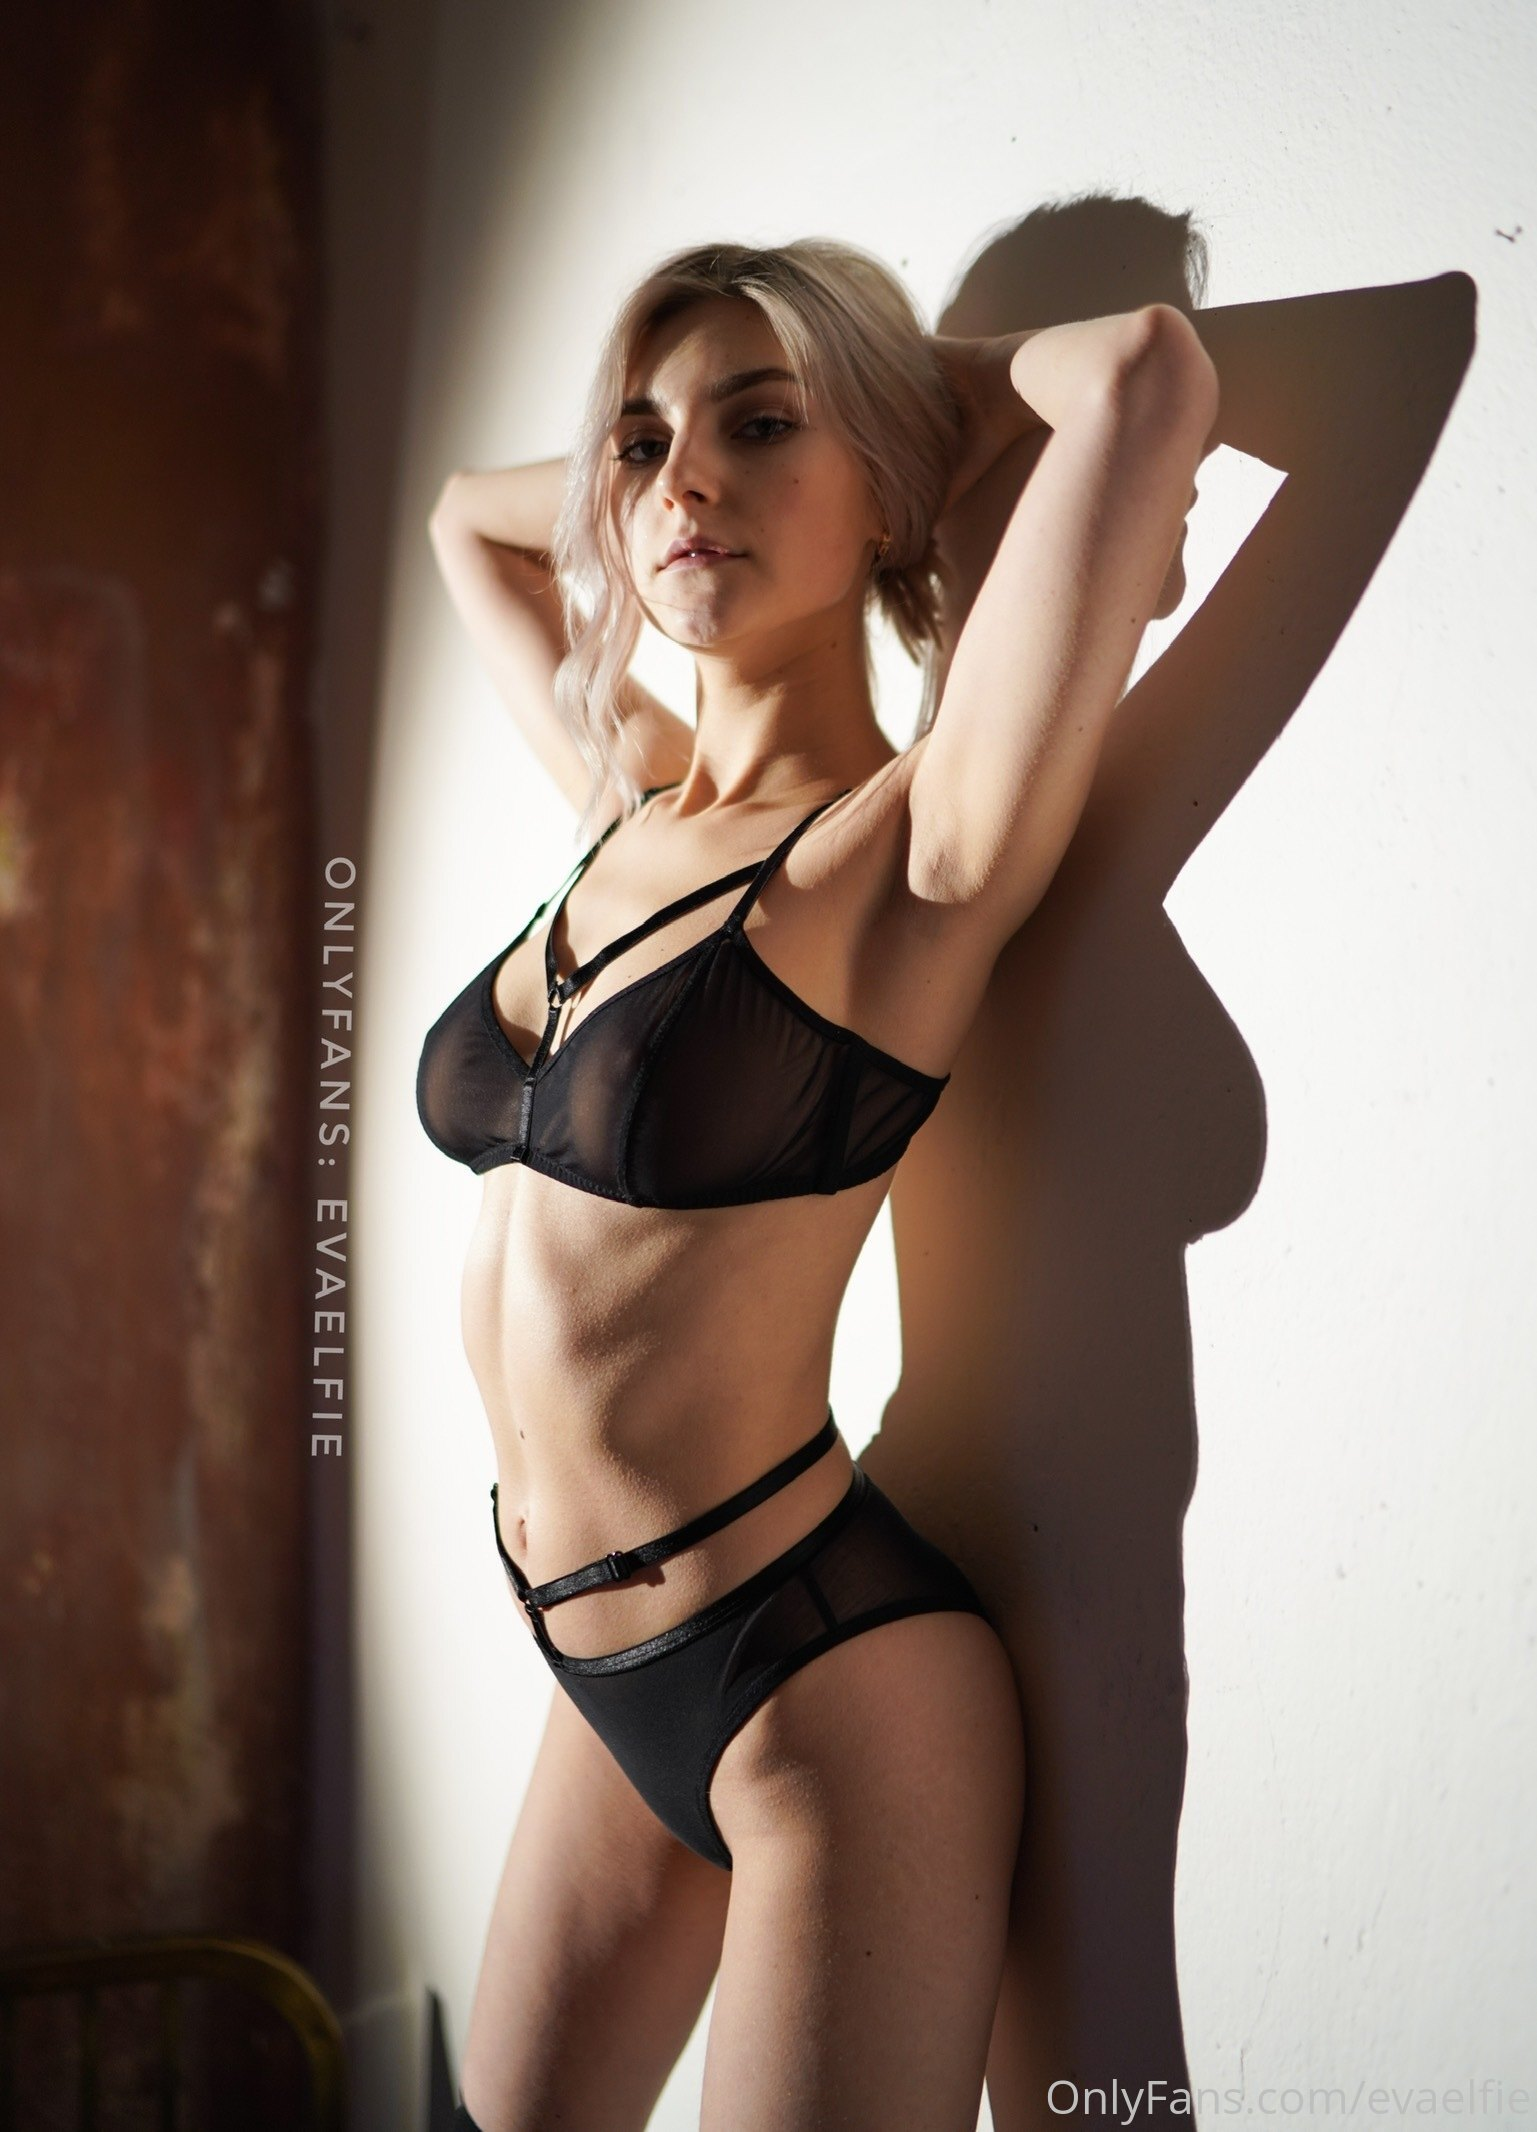 Eva Elfie, Evaelfie, Onlyfans 0032